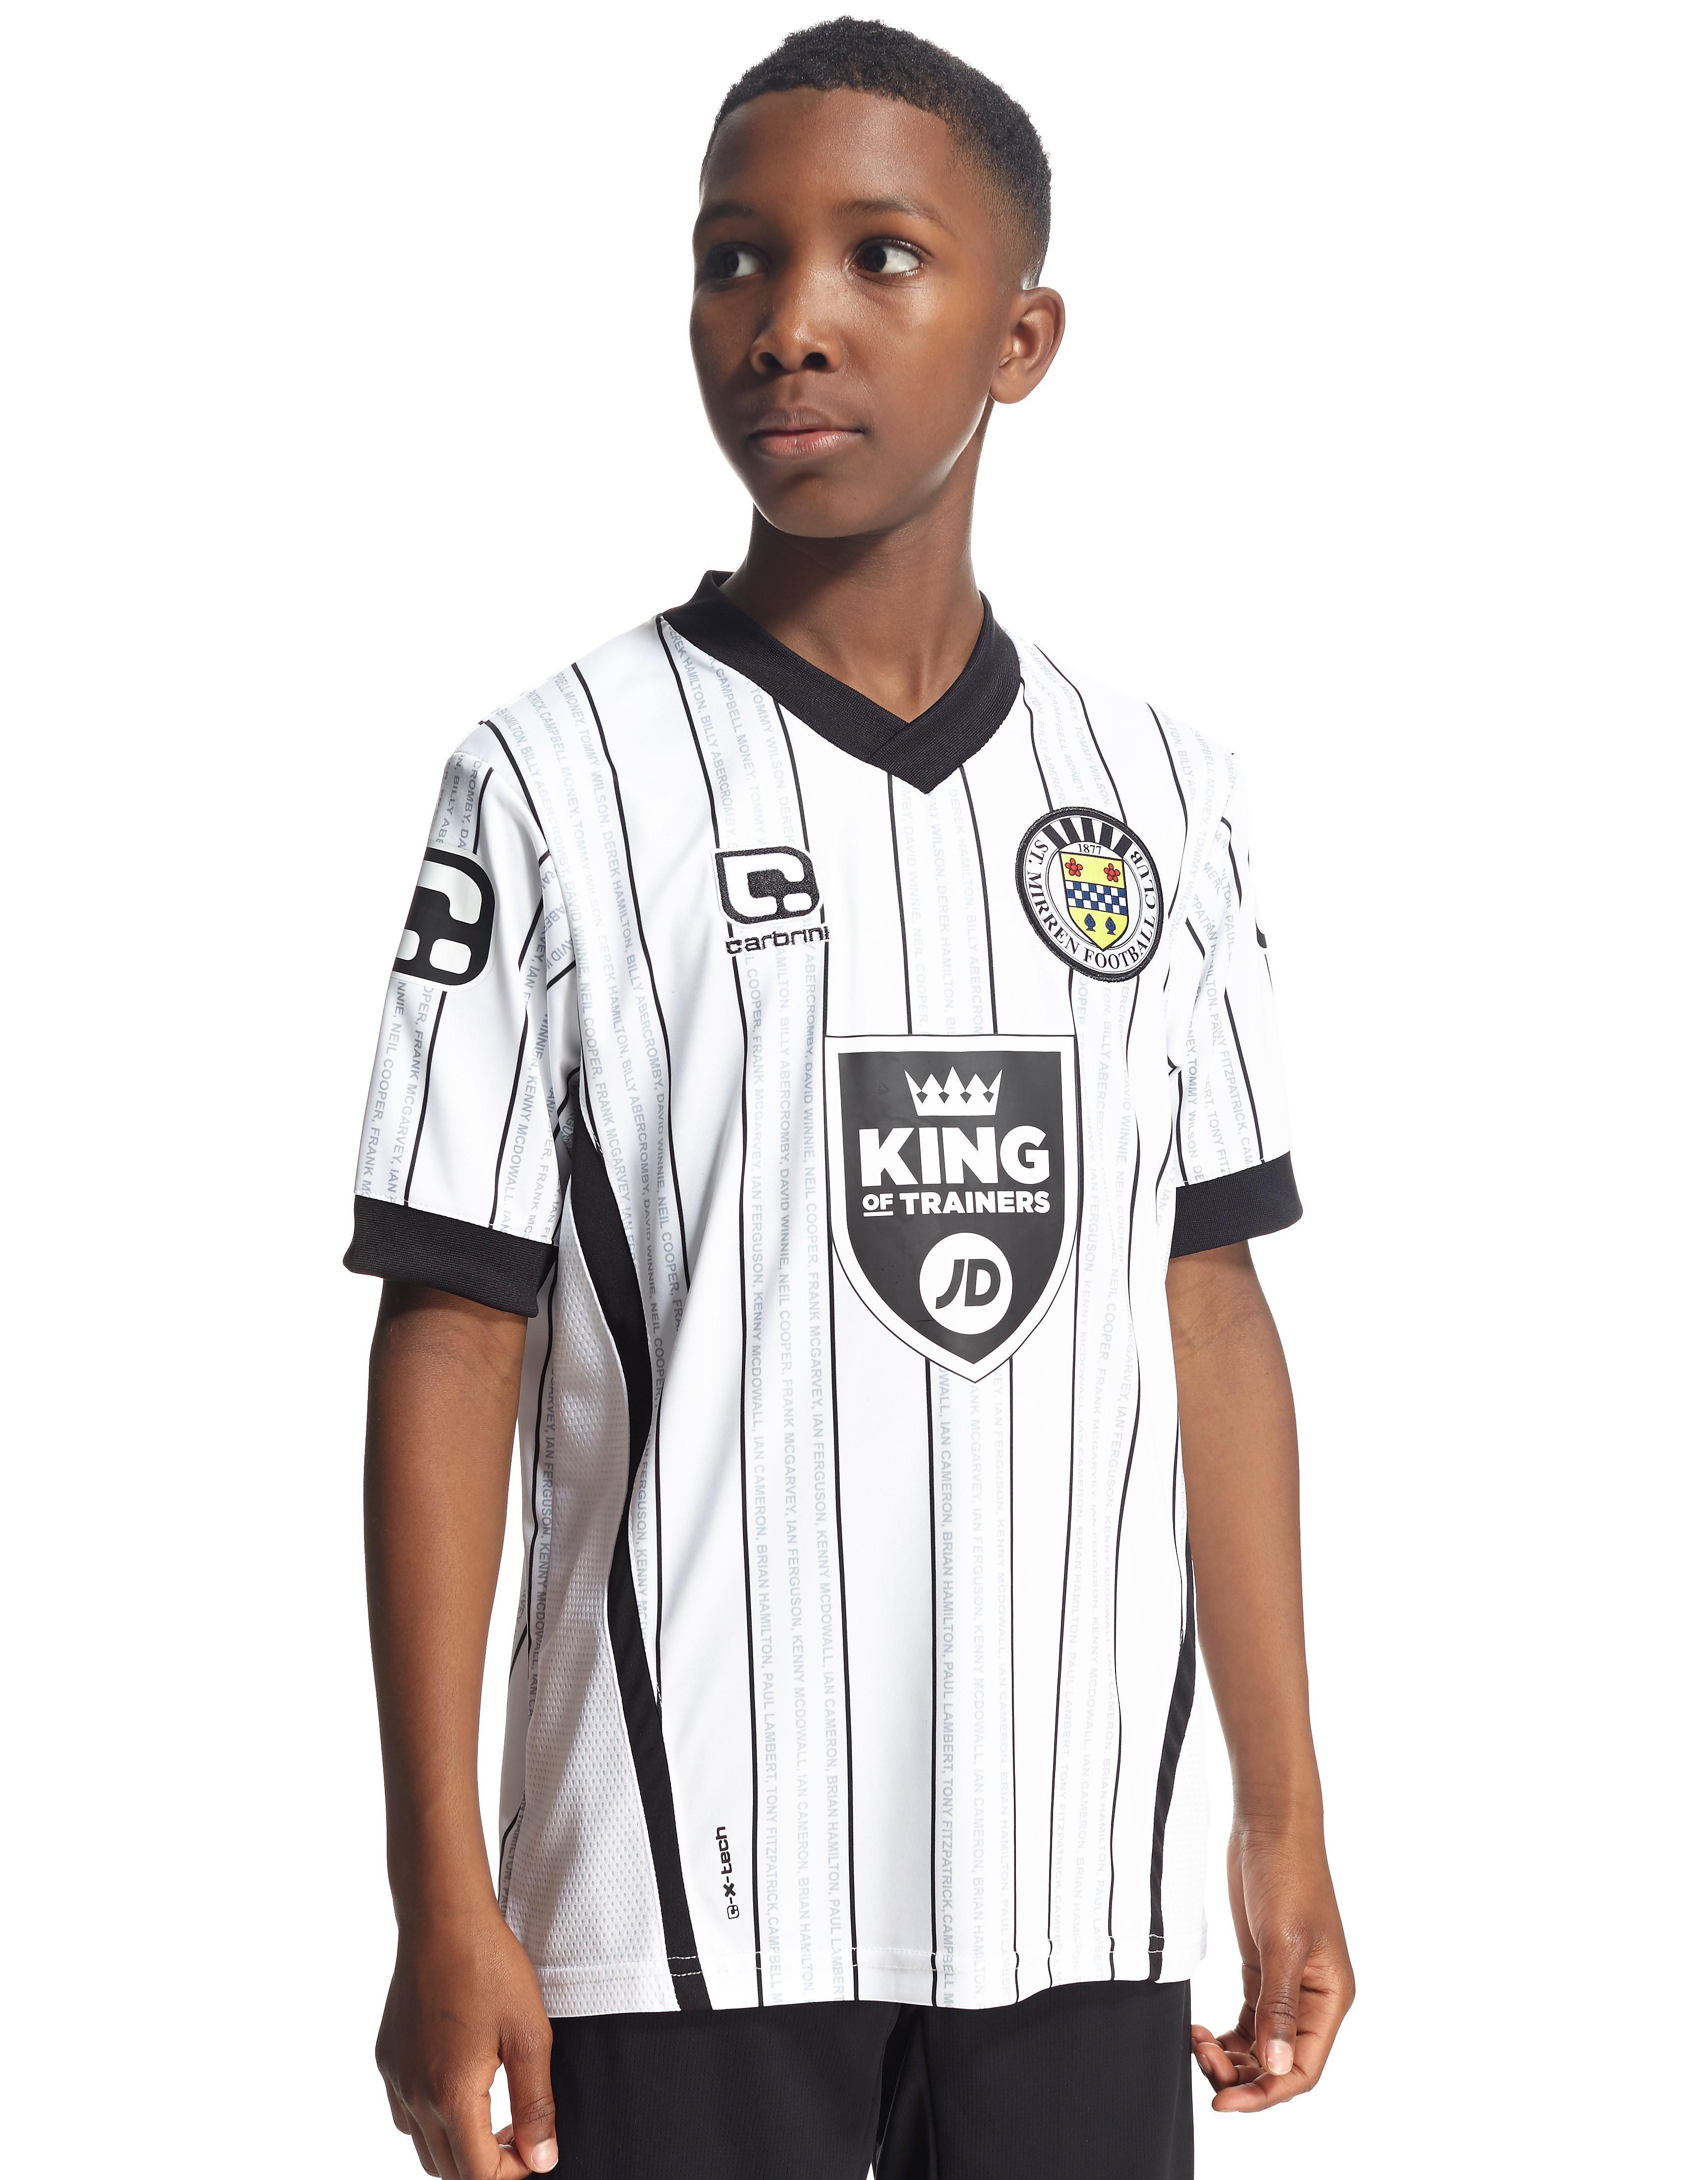 Carbrini St Mirren FC 2016/17 Home Shirt Jnr PRE ORDER